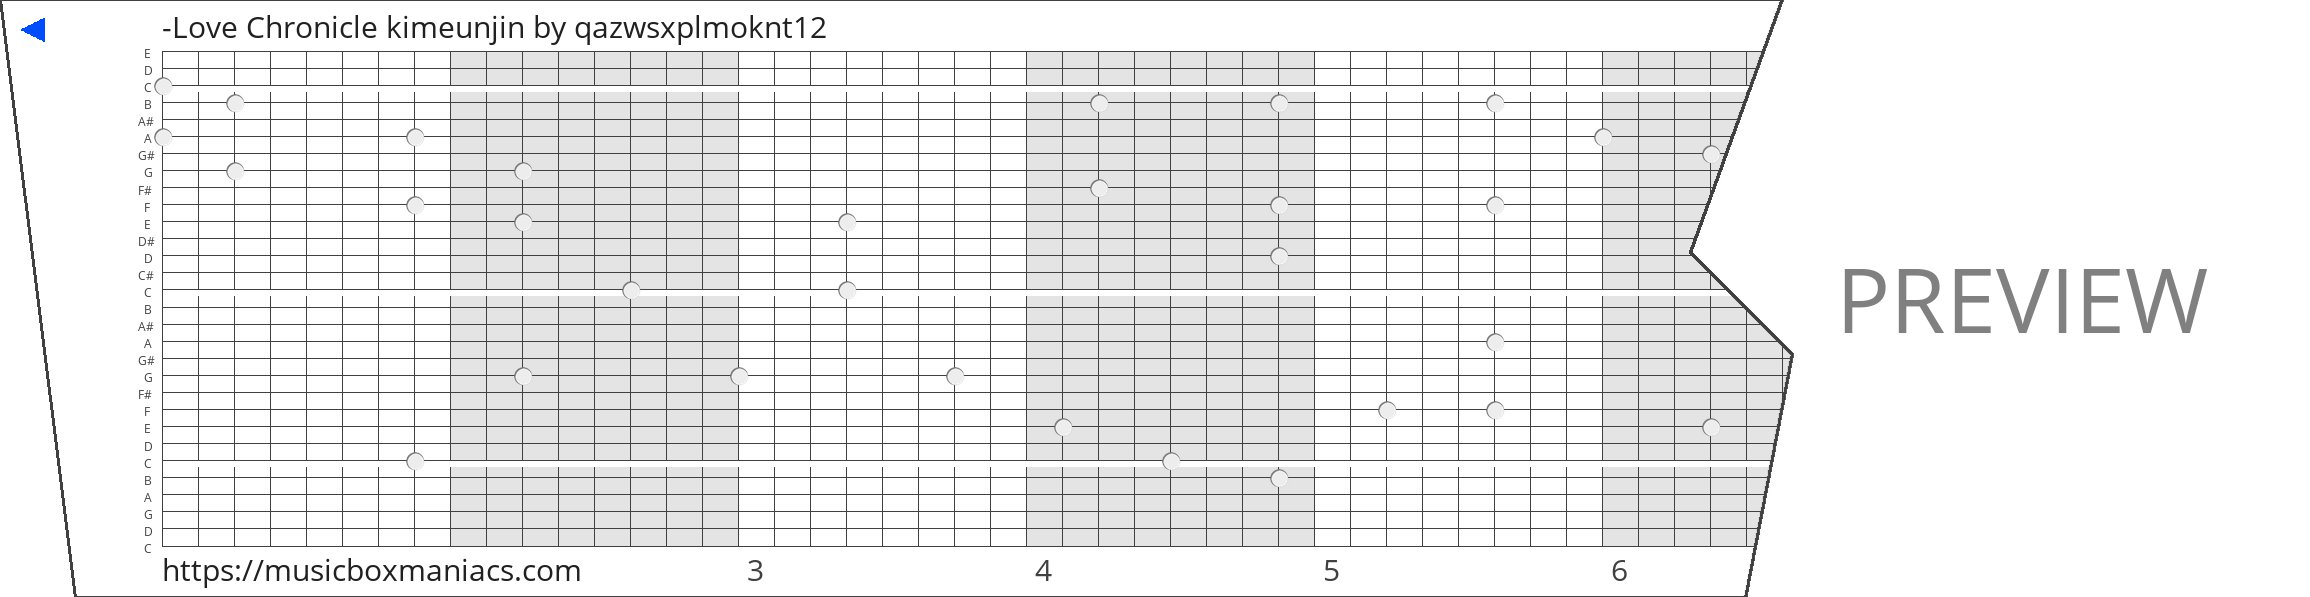 -Love Chronicle kimeunjin 30 note music box paper strip